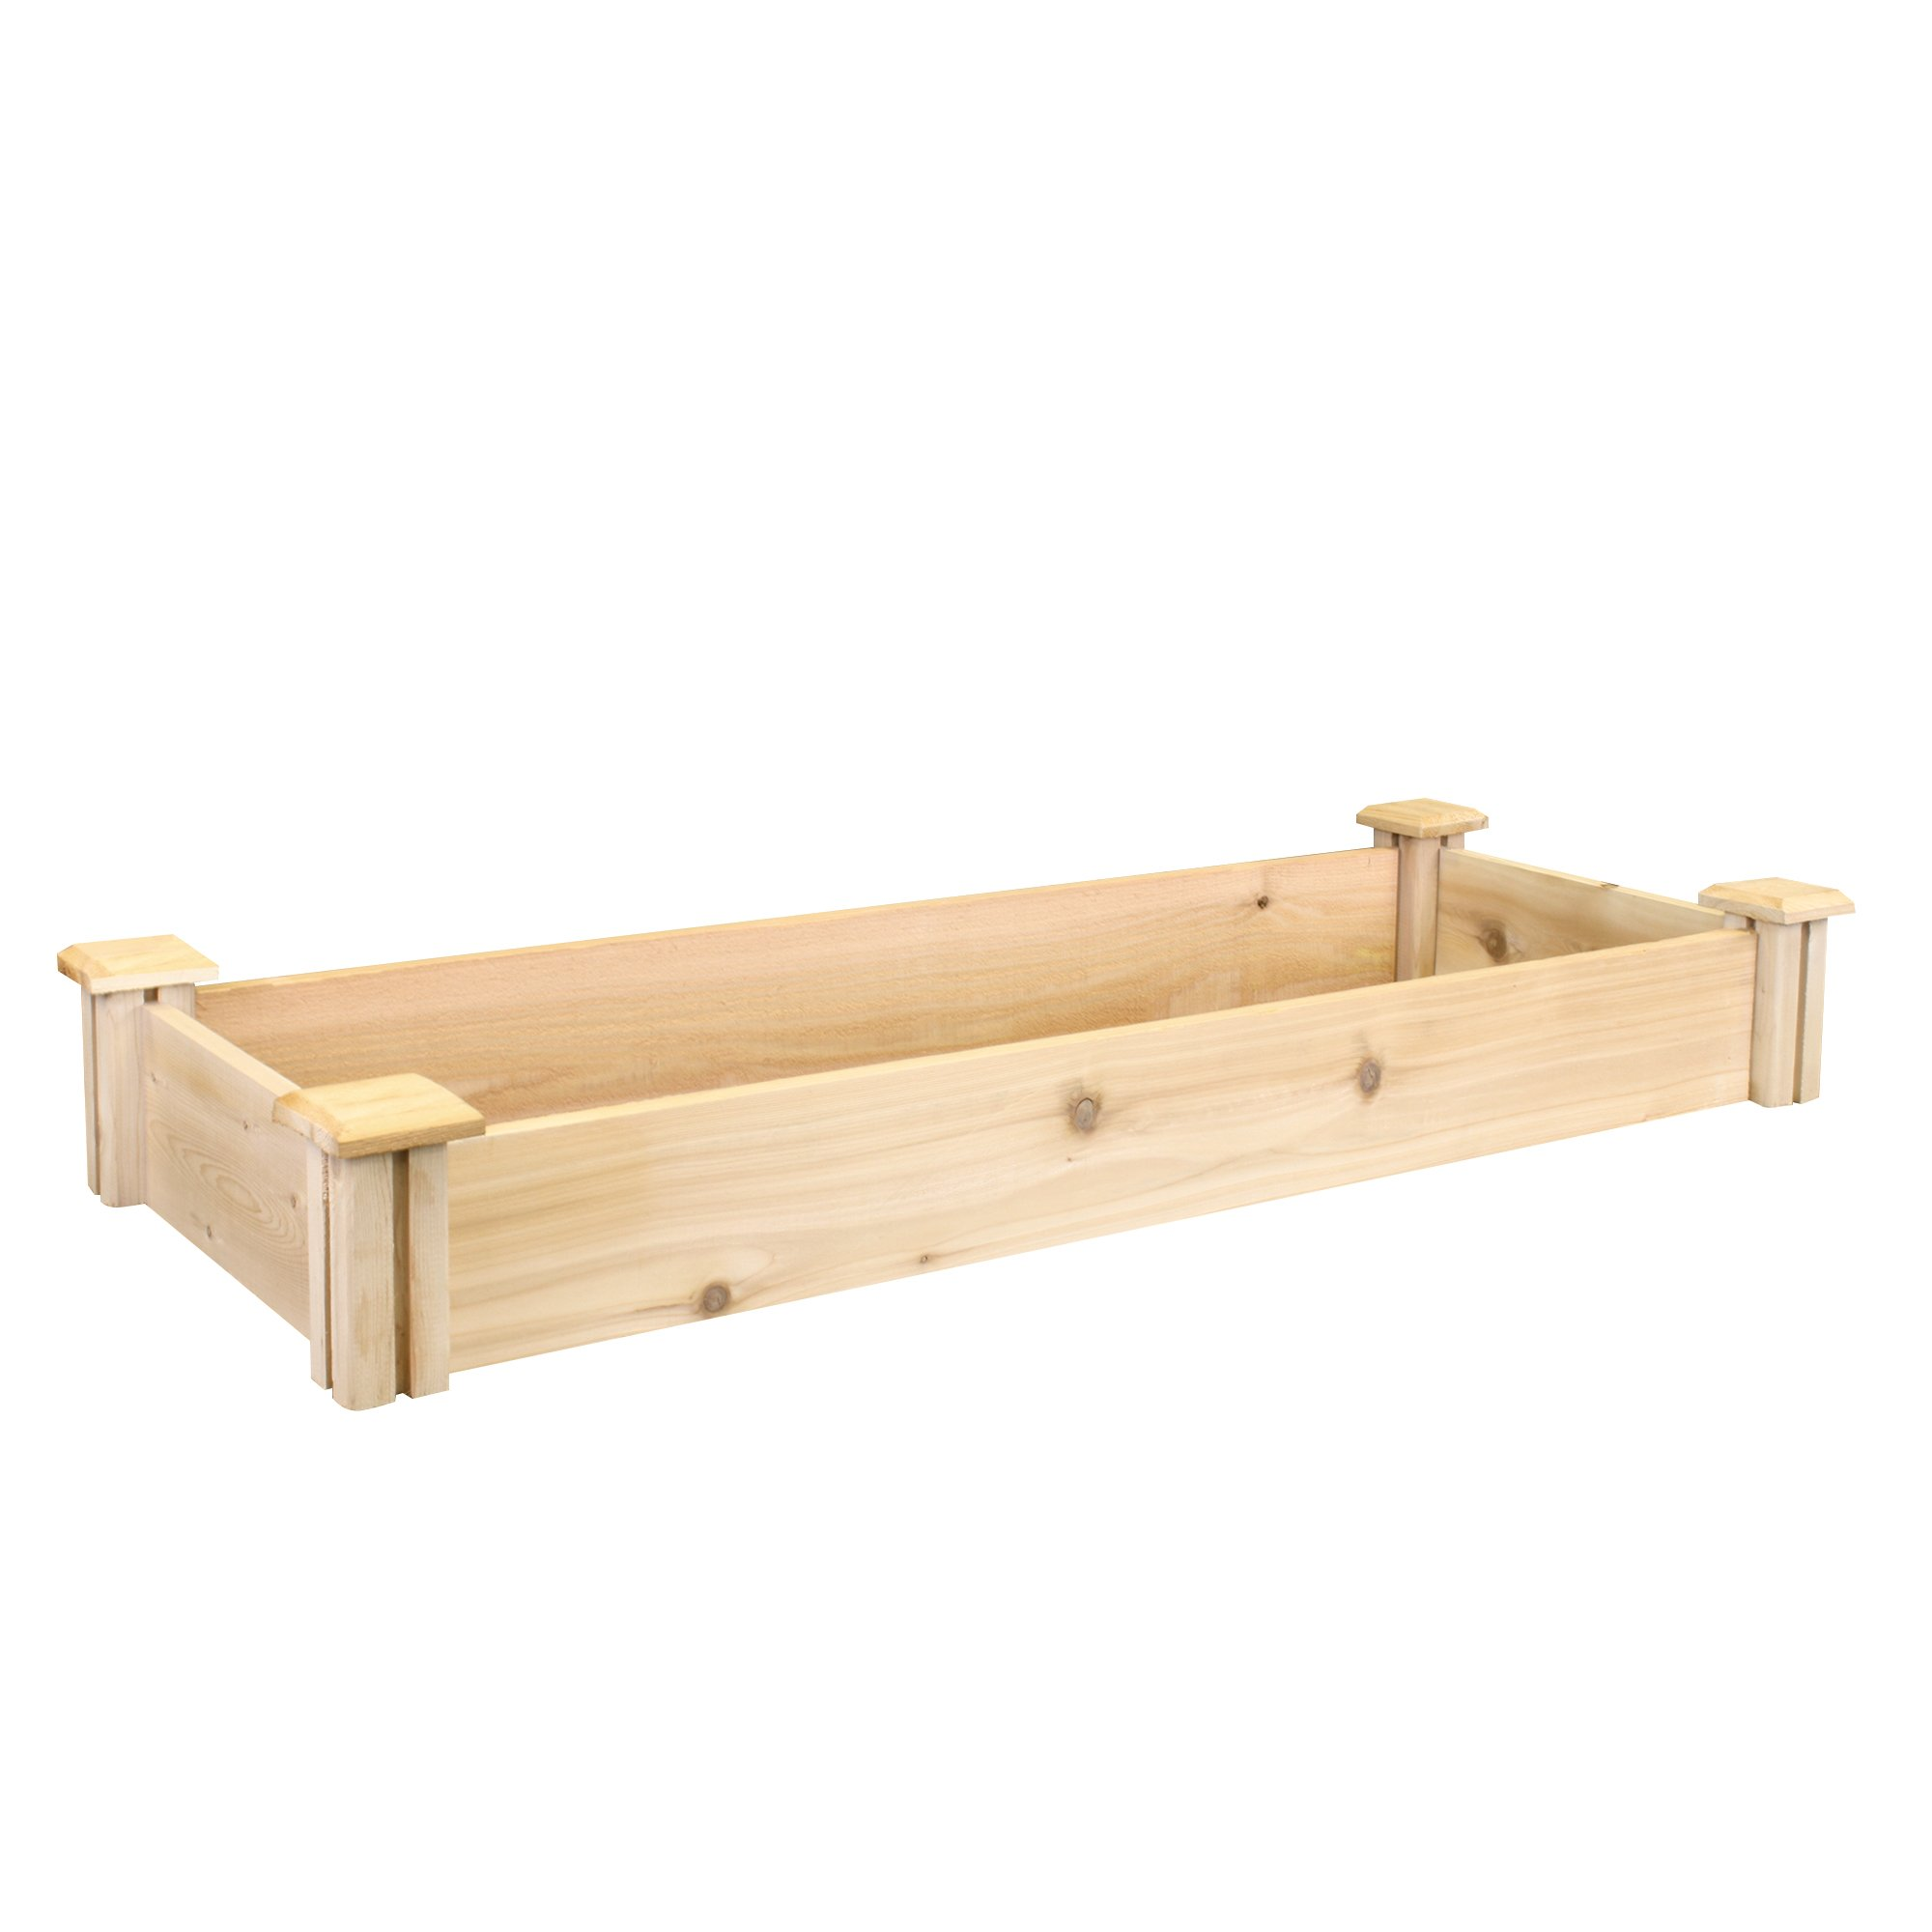 Greenes Fence Premium Cedar Raised Garden Bed, 16'' x 48'' x 5.5''